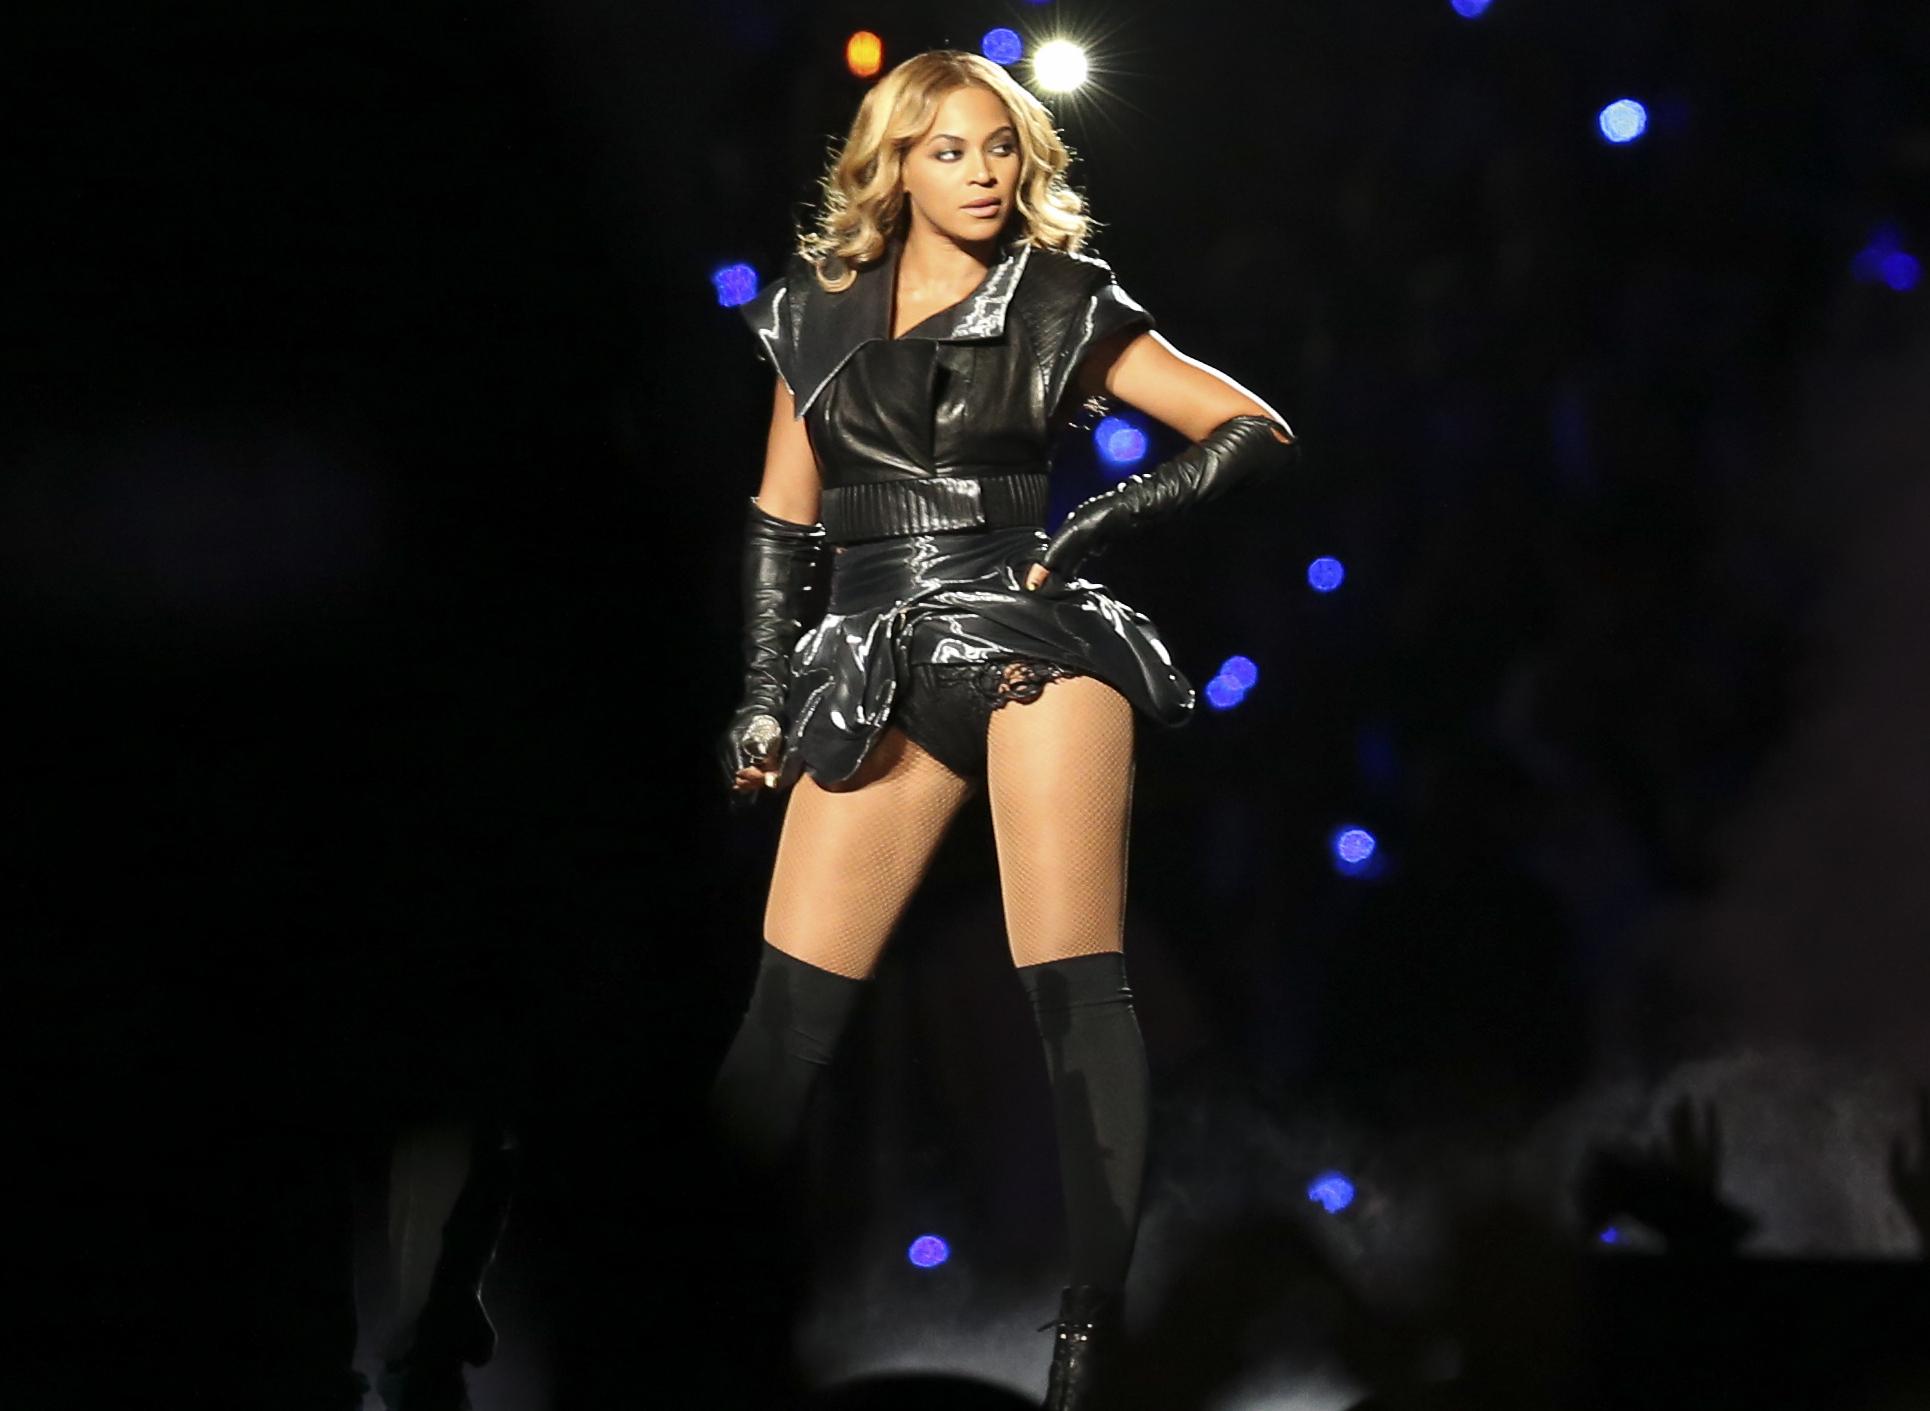 Beyoncé at Super Bowl XLVII halftime show